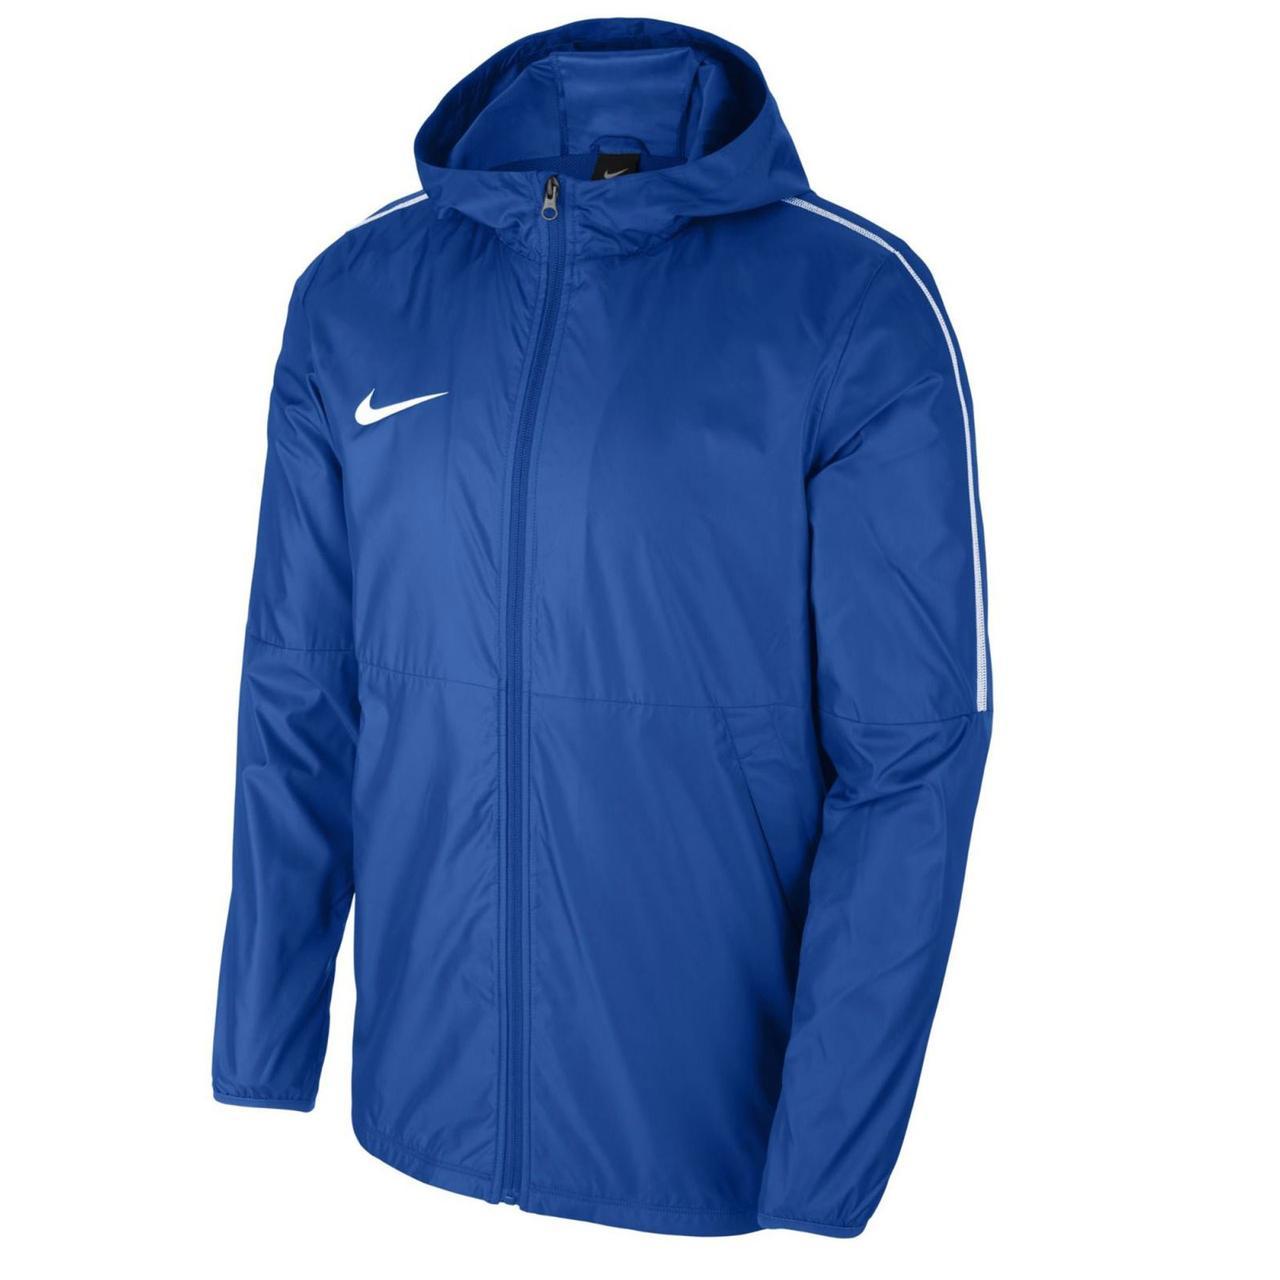 f7580dff Ветровка Nike Dry Park 18 Rain Jacket AA2090-463 (Оригинал) - Football Mall